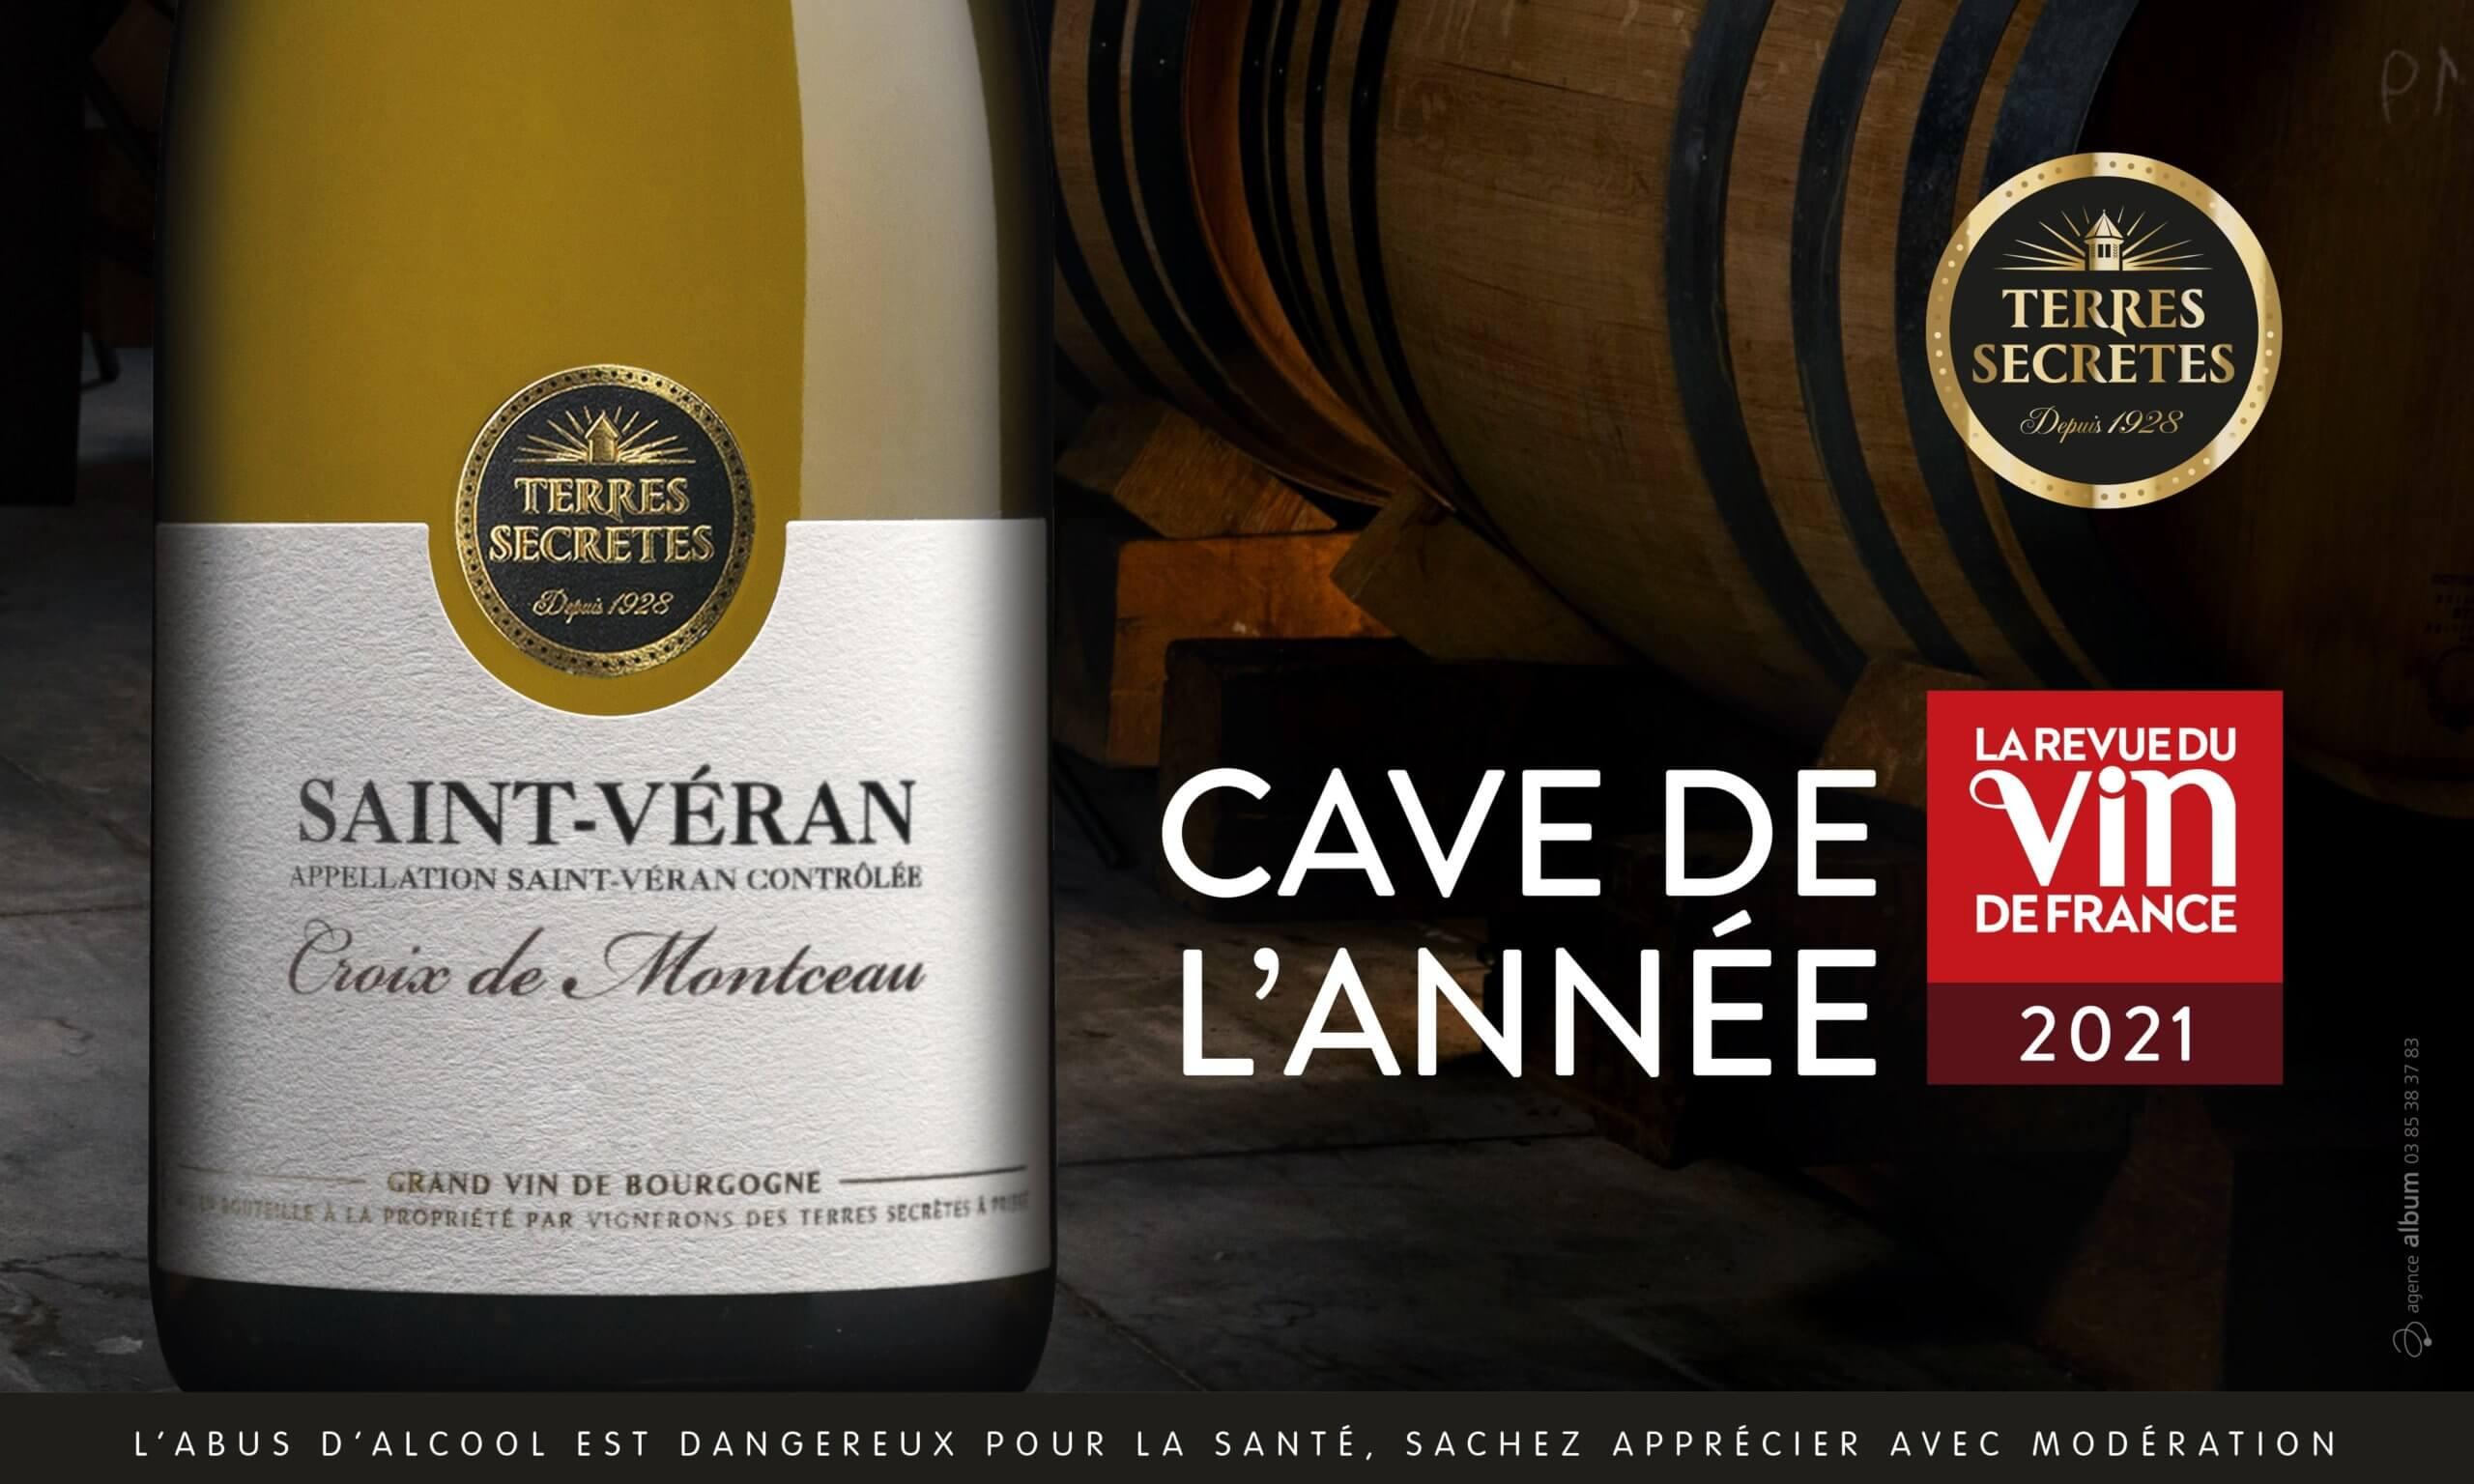 Grands Prix de la Revue du Vin de France 2021